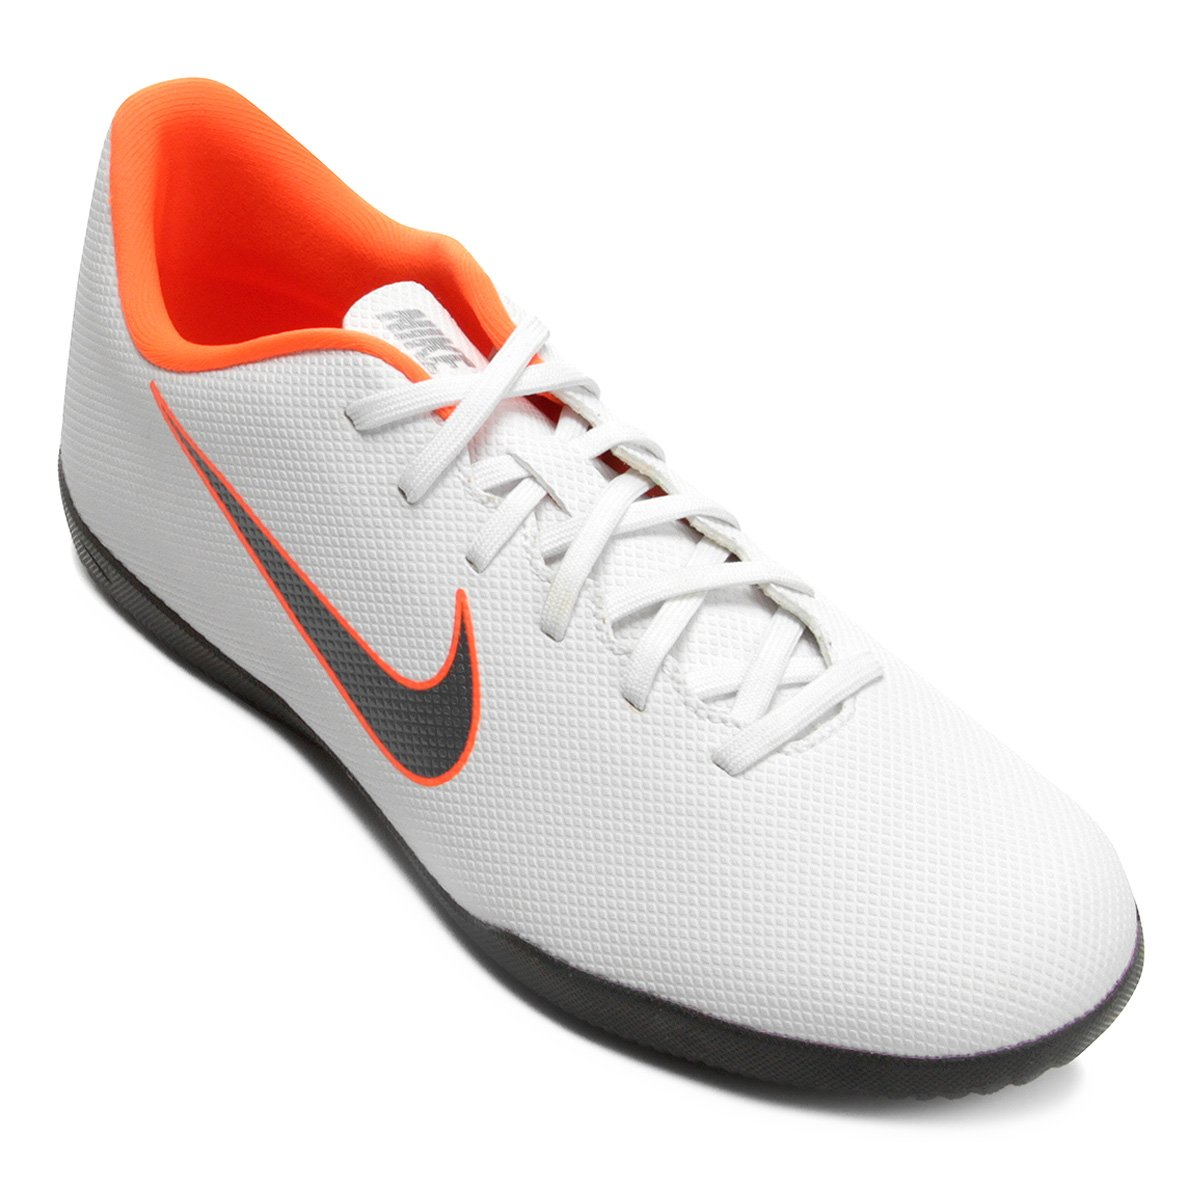 ea09dbc20f Chuteira Futsal Nike Mercurial Vapor 12 Club - Branco e Cinza - Compre  Agora